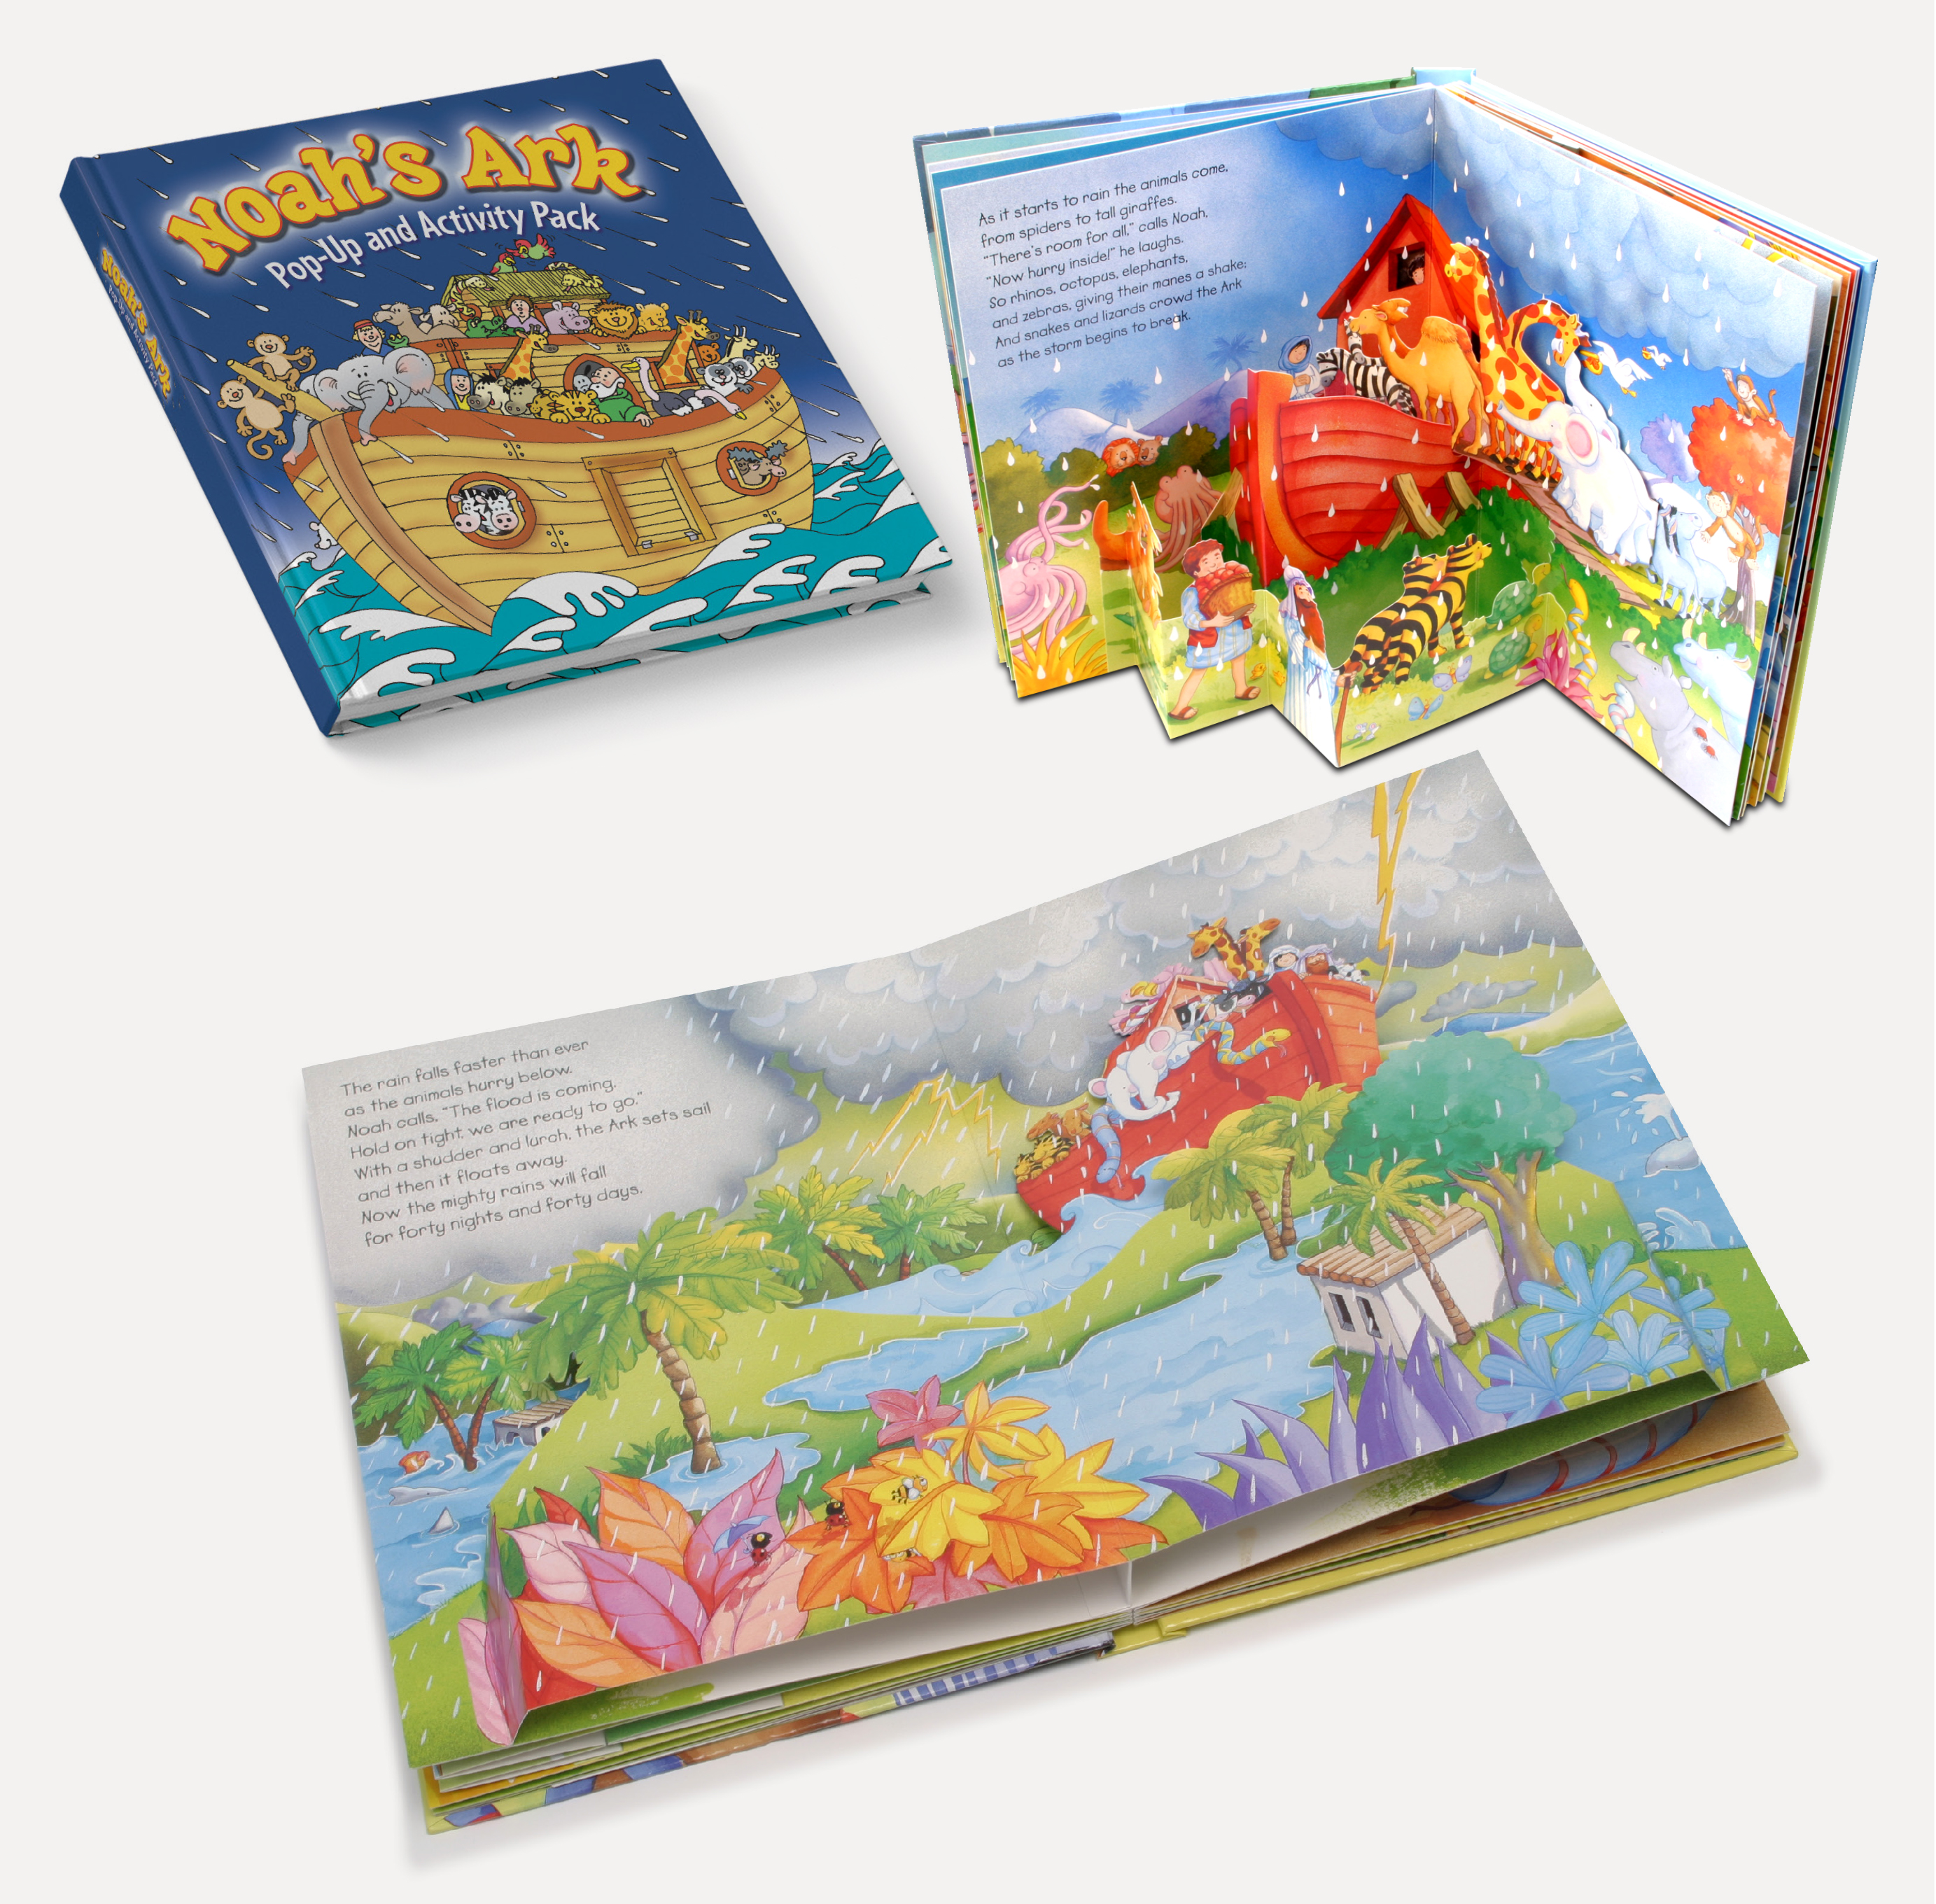 CHILDRENS-BOOKS-PAGE-PR_07